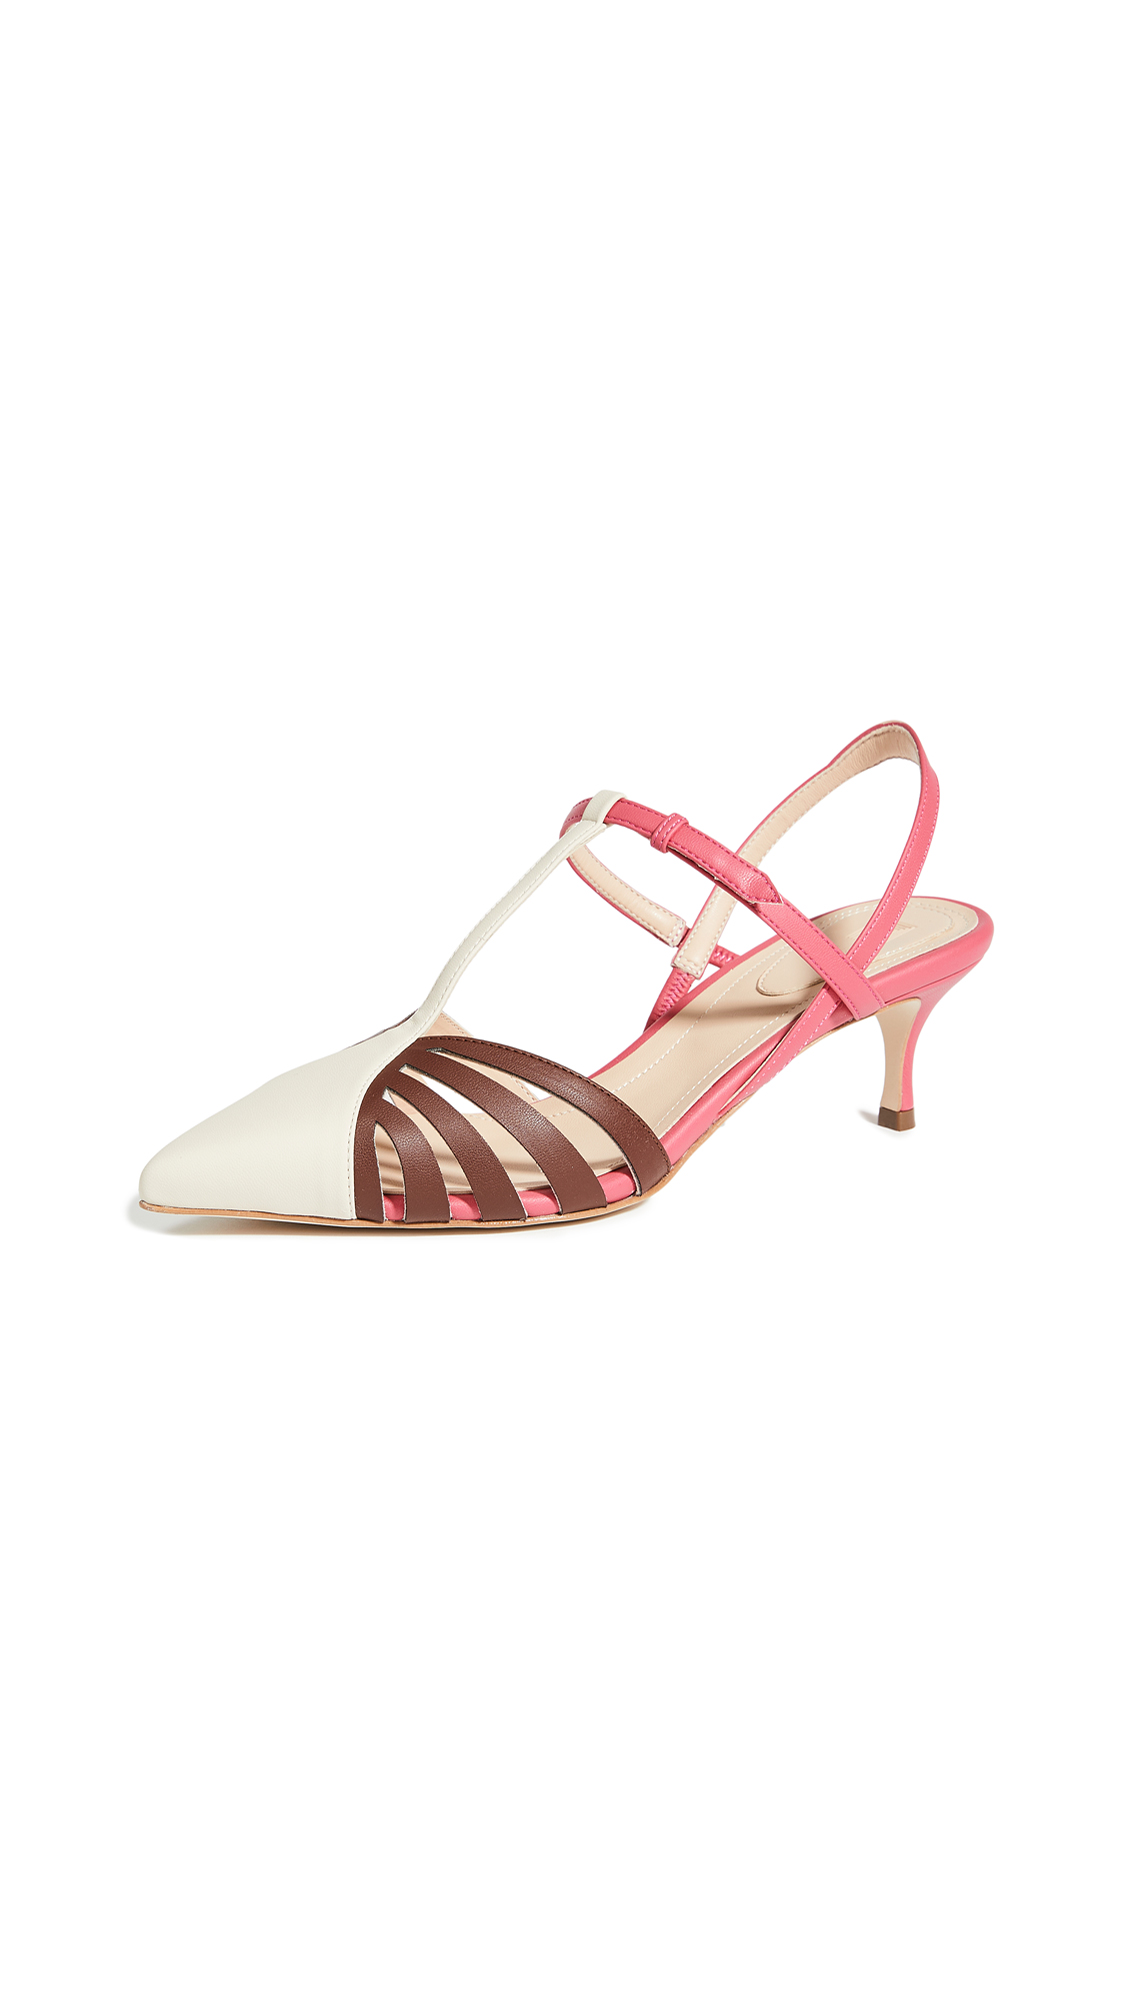 Rosie Assoulin Charisse Slingback Lattice Heels - 40% Off Sale